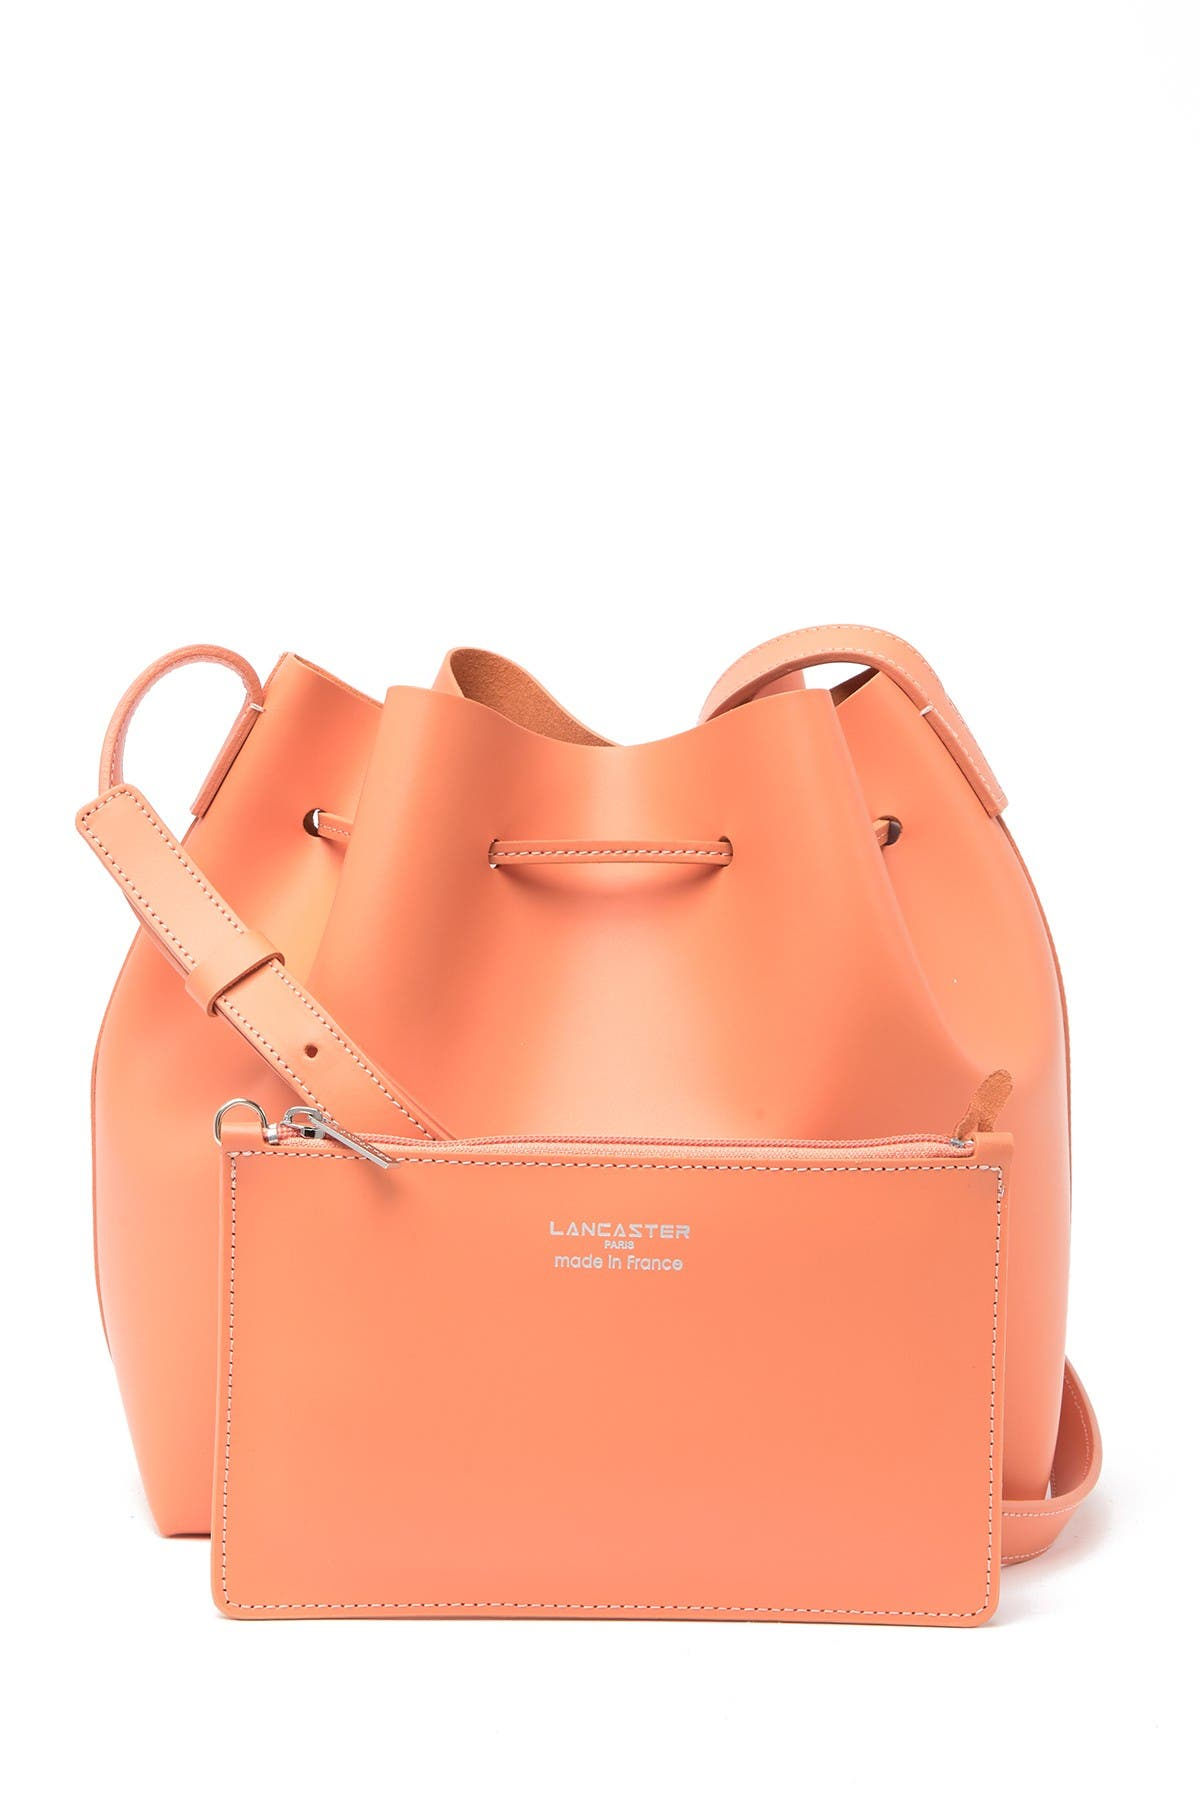 Image of Lancaster Paris Matte Smooth Leather Bucket Bag & Pouch